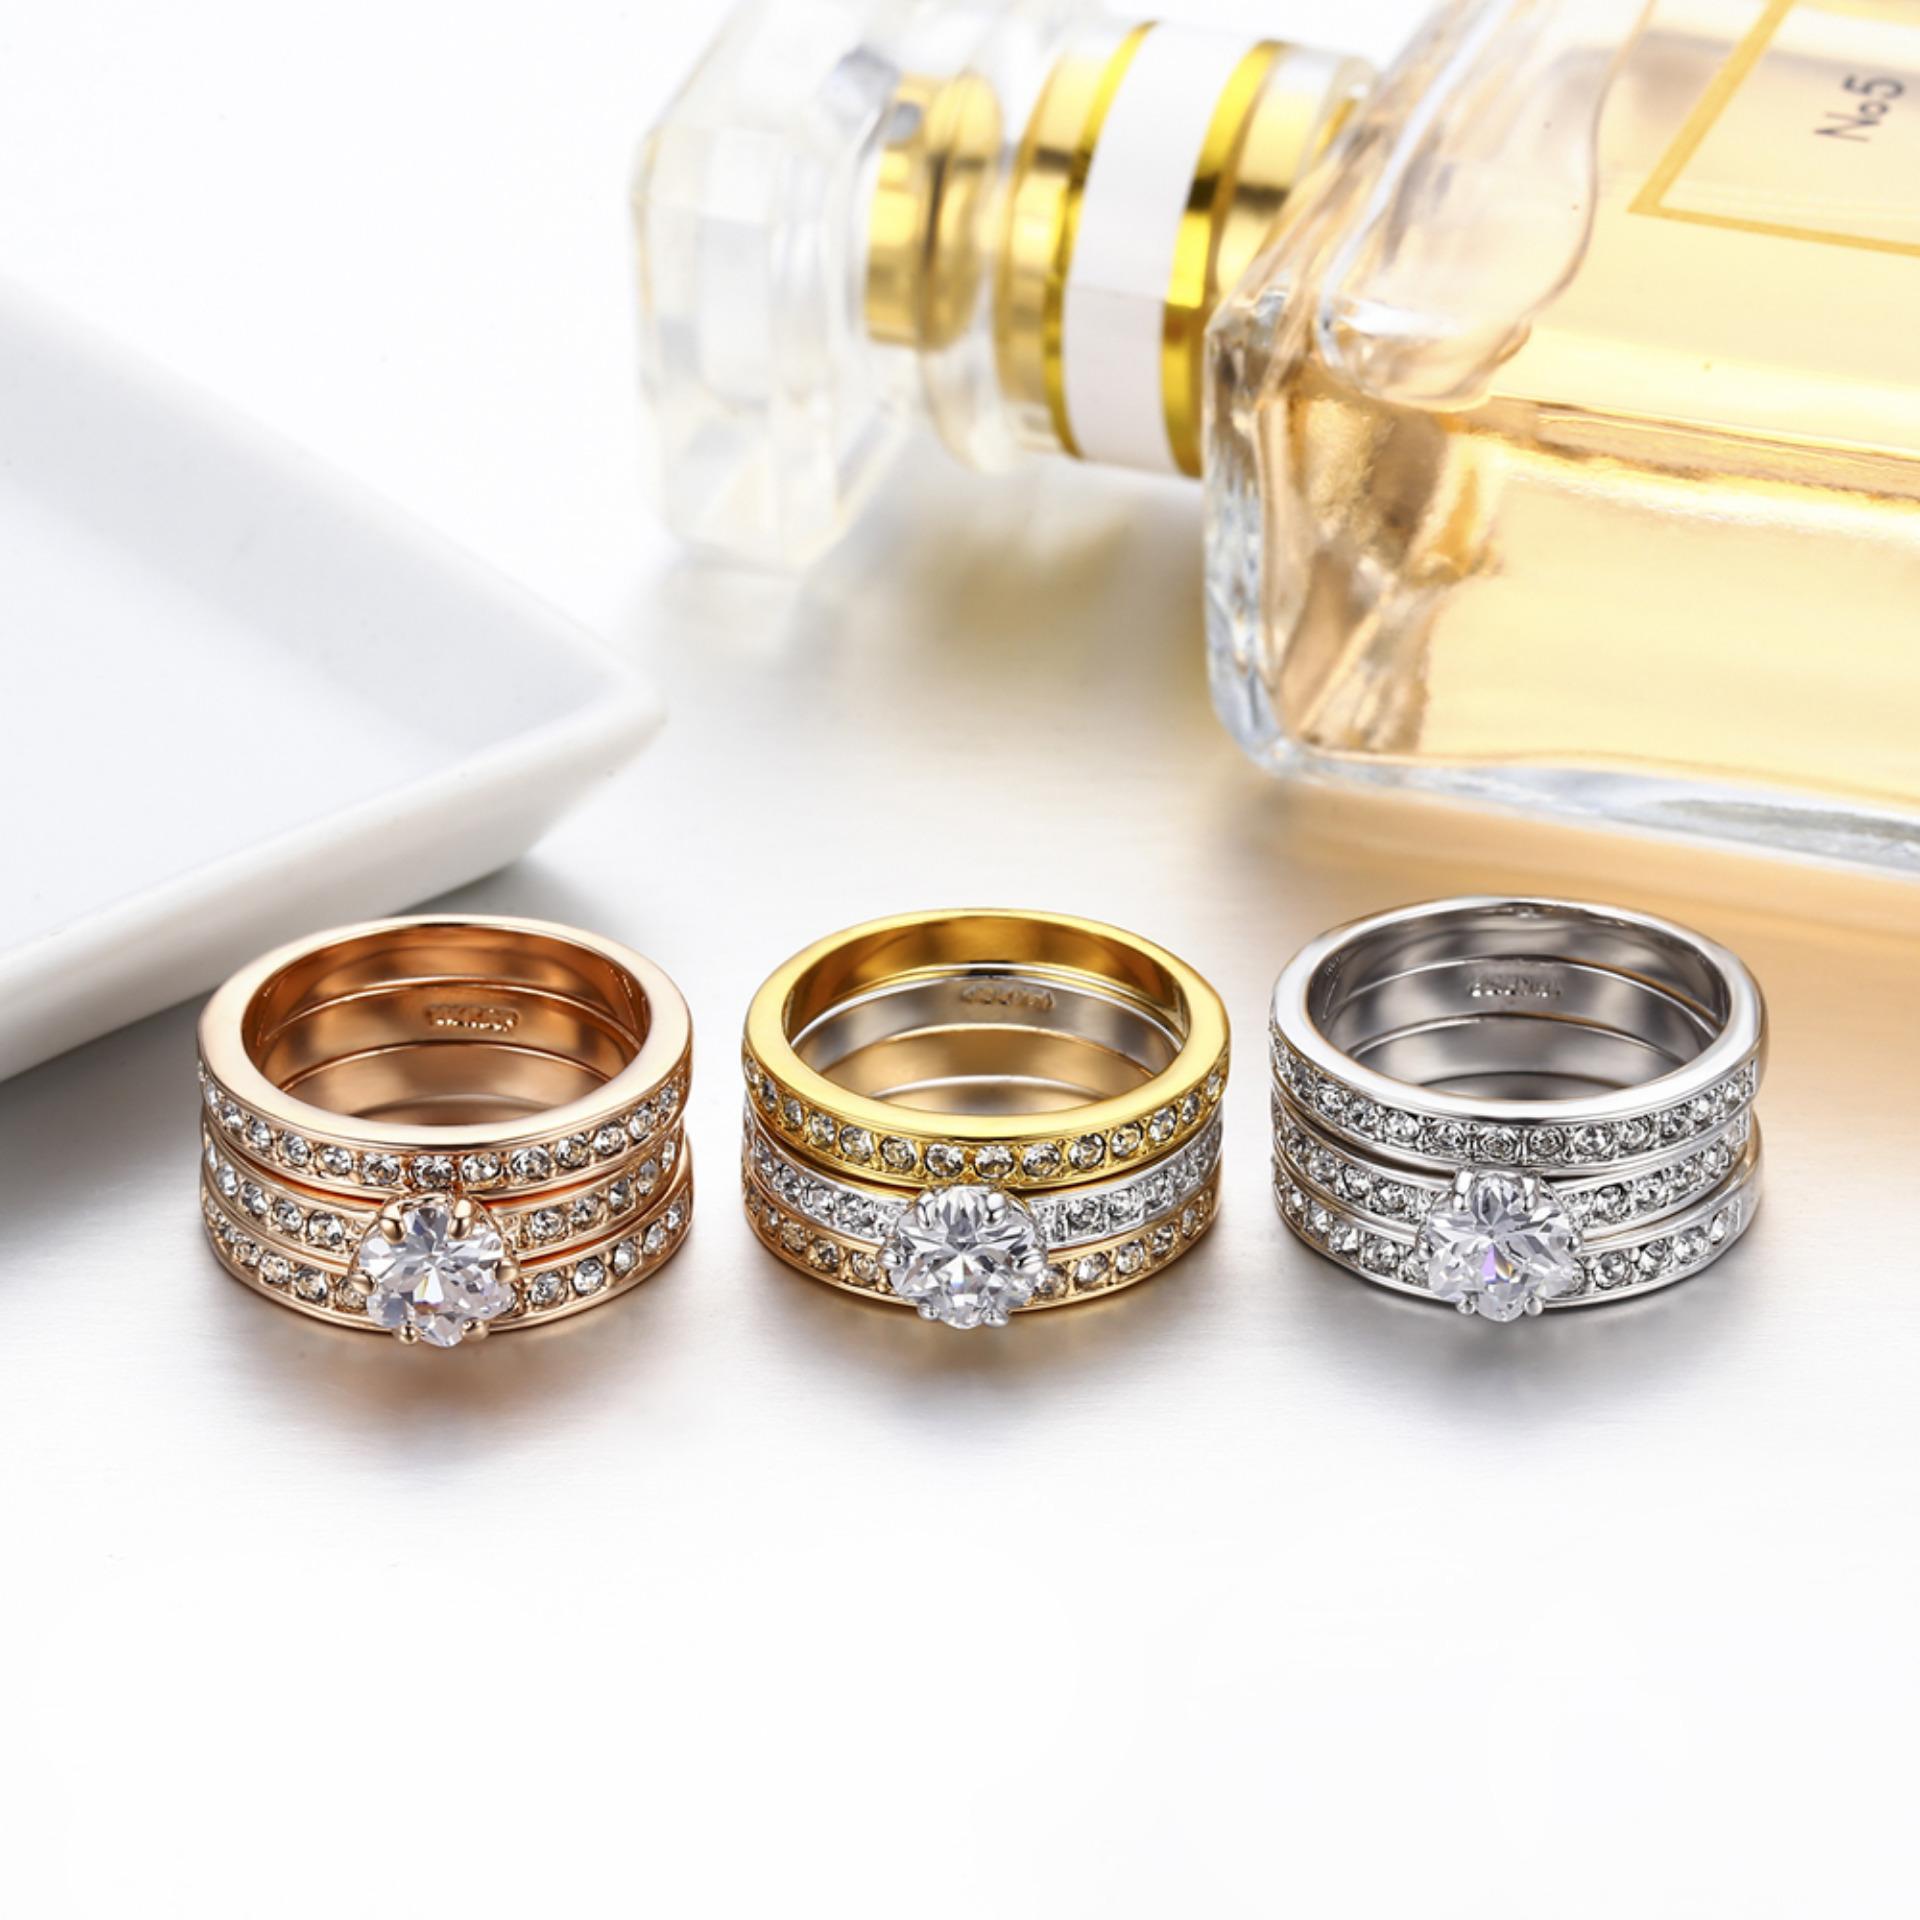 Pinannie 3warnd putih/mawar emas berlapis kubik Zirconia Berliancincin kawin perhiasan untuk .